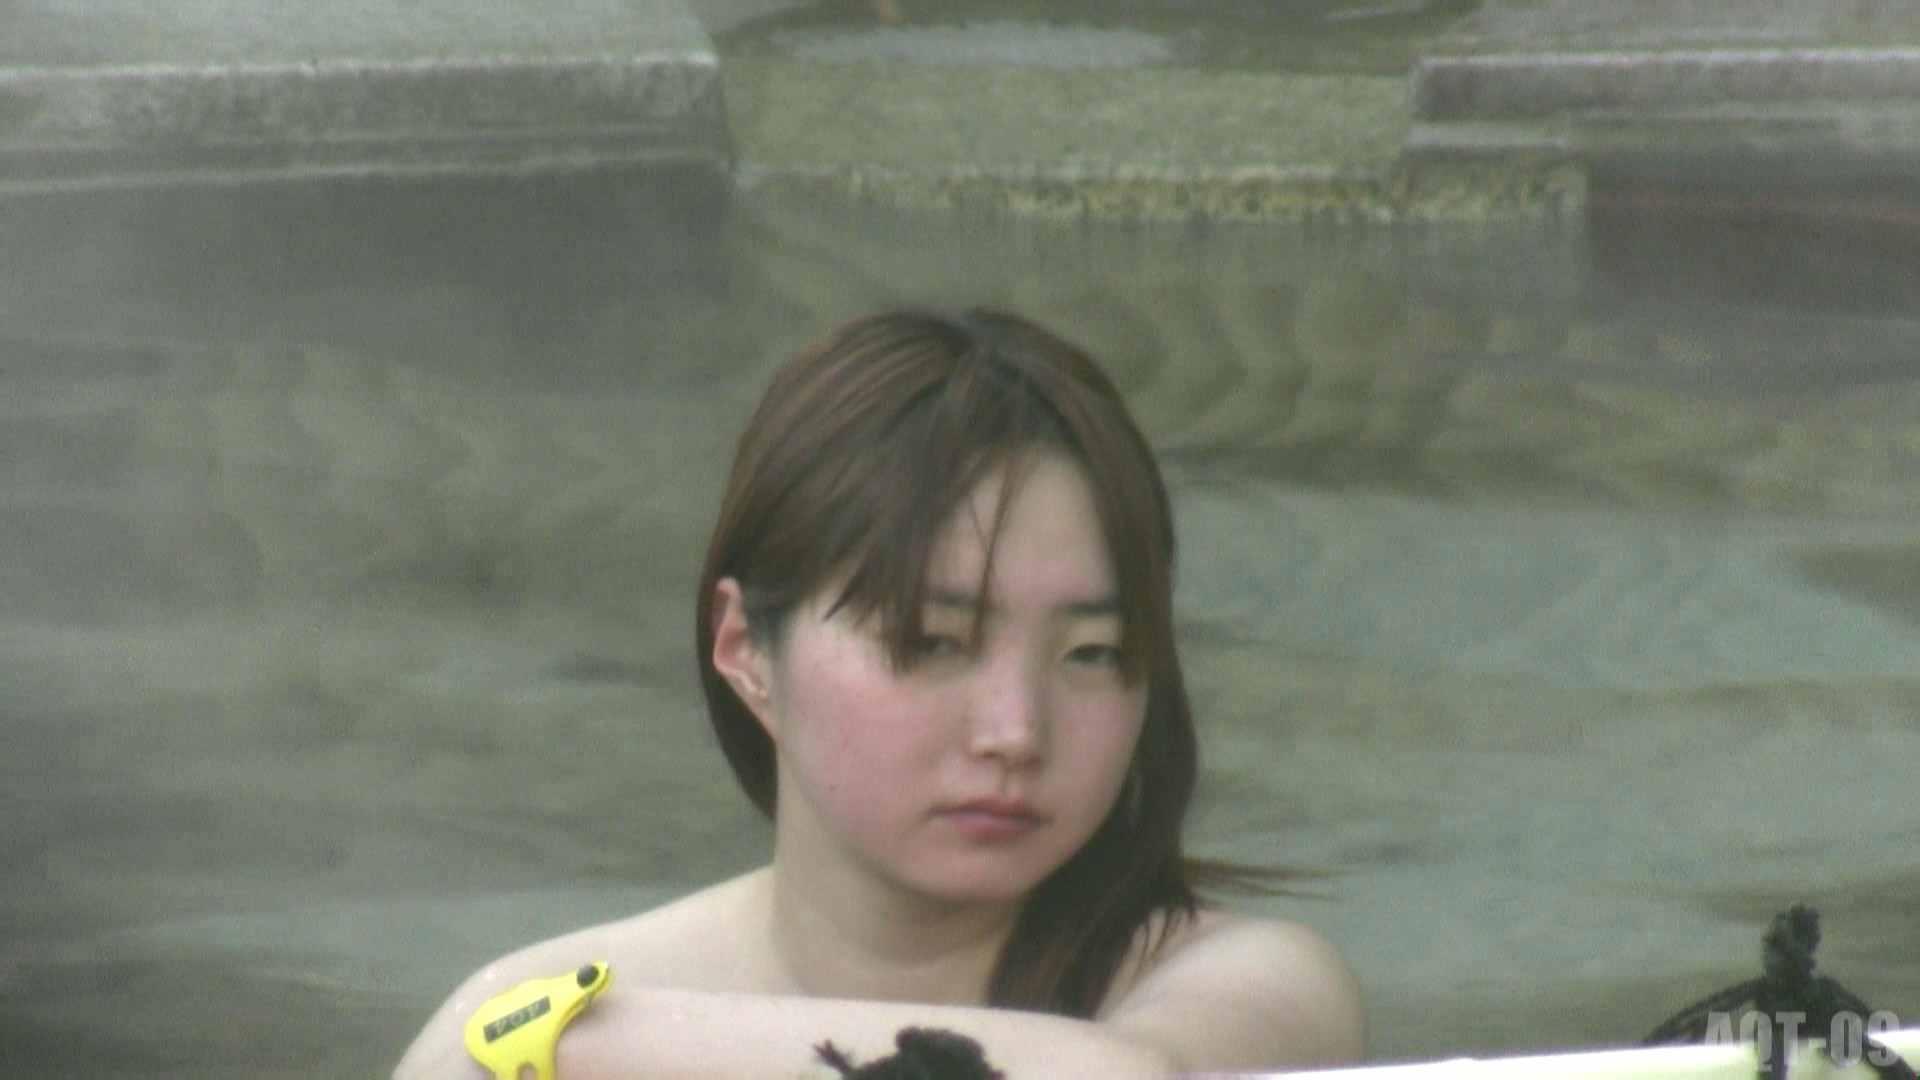 Aquaな露天風呂Vol.781 露天風呂   OLのエロ生活  93連発 82